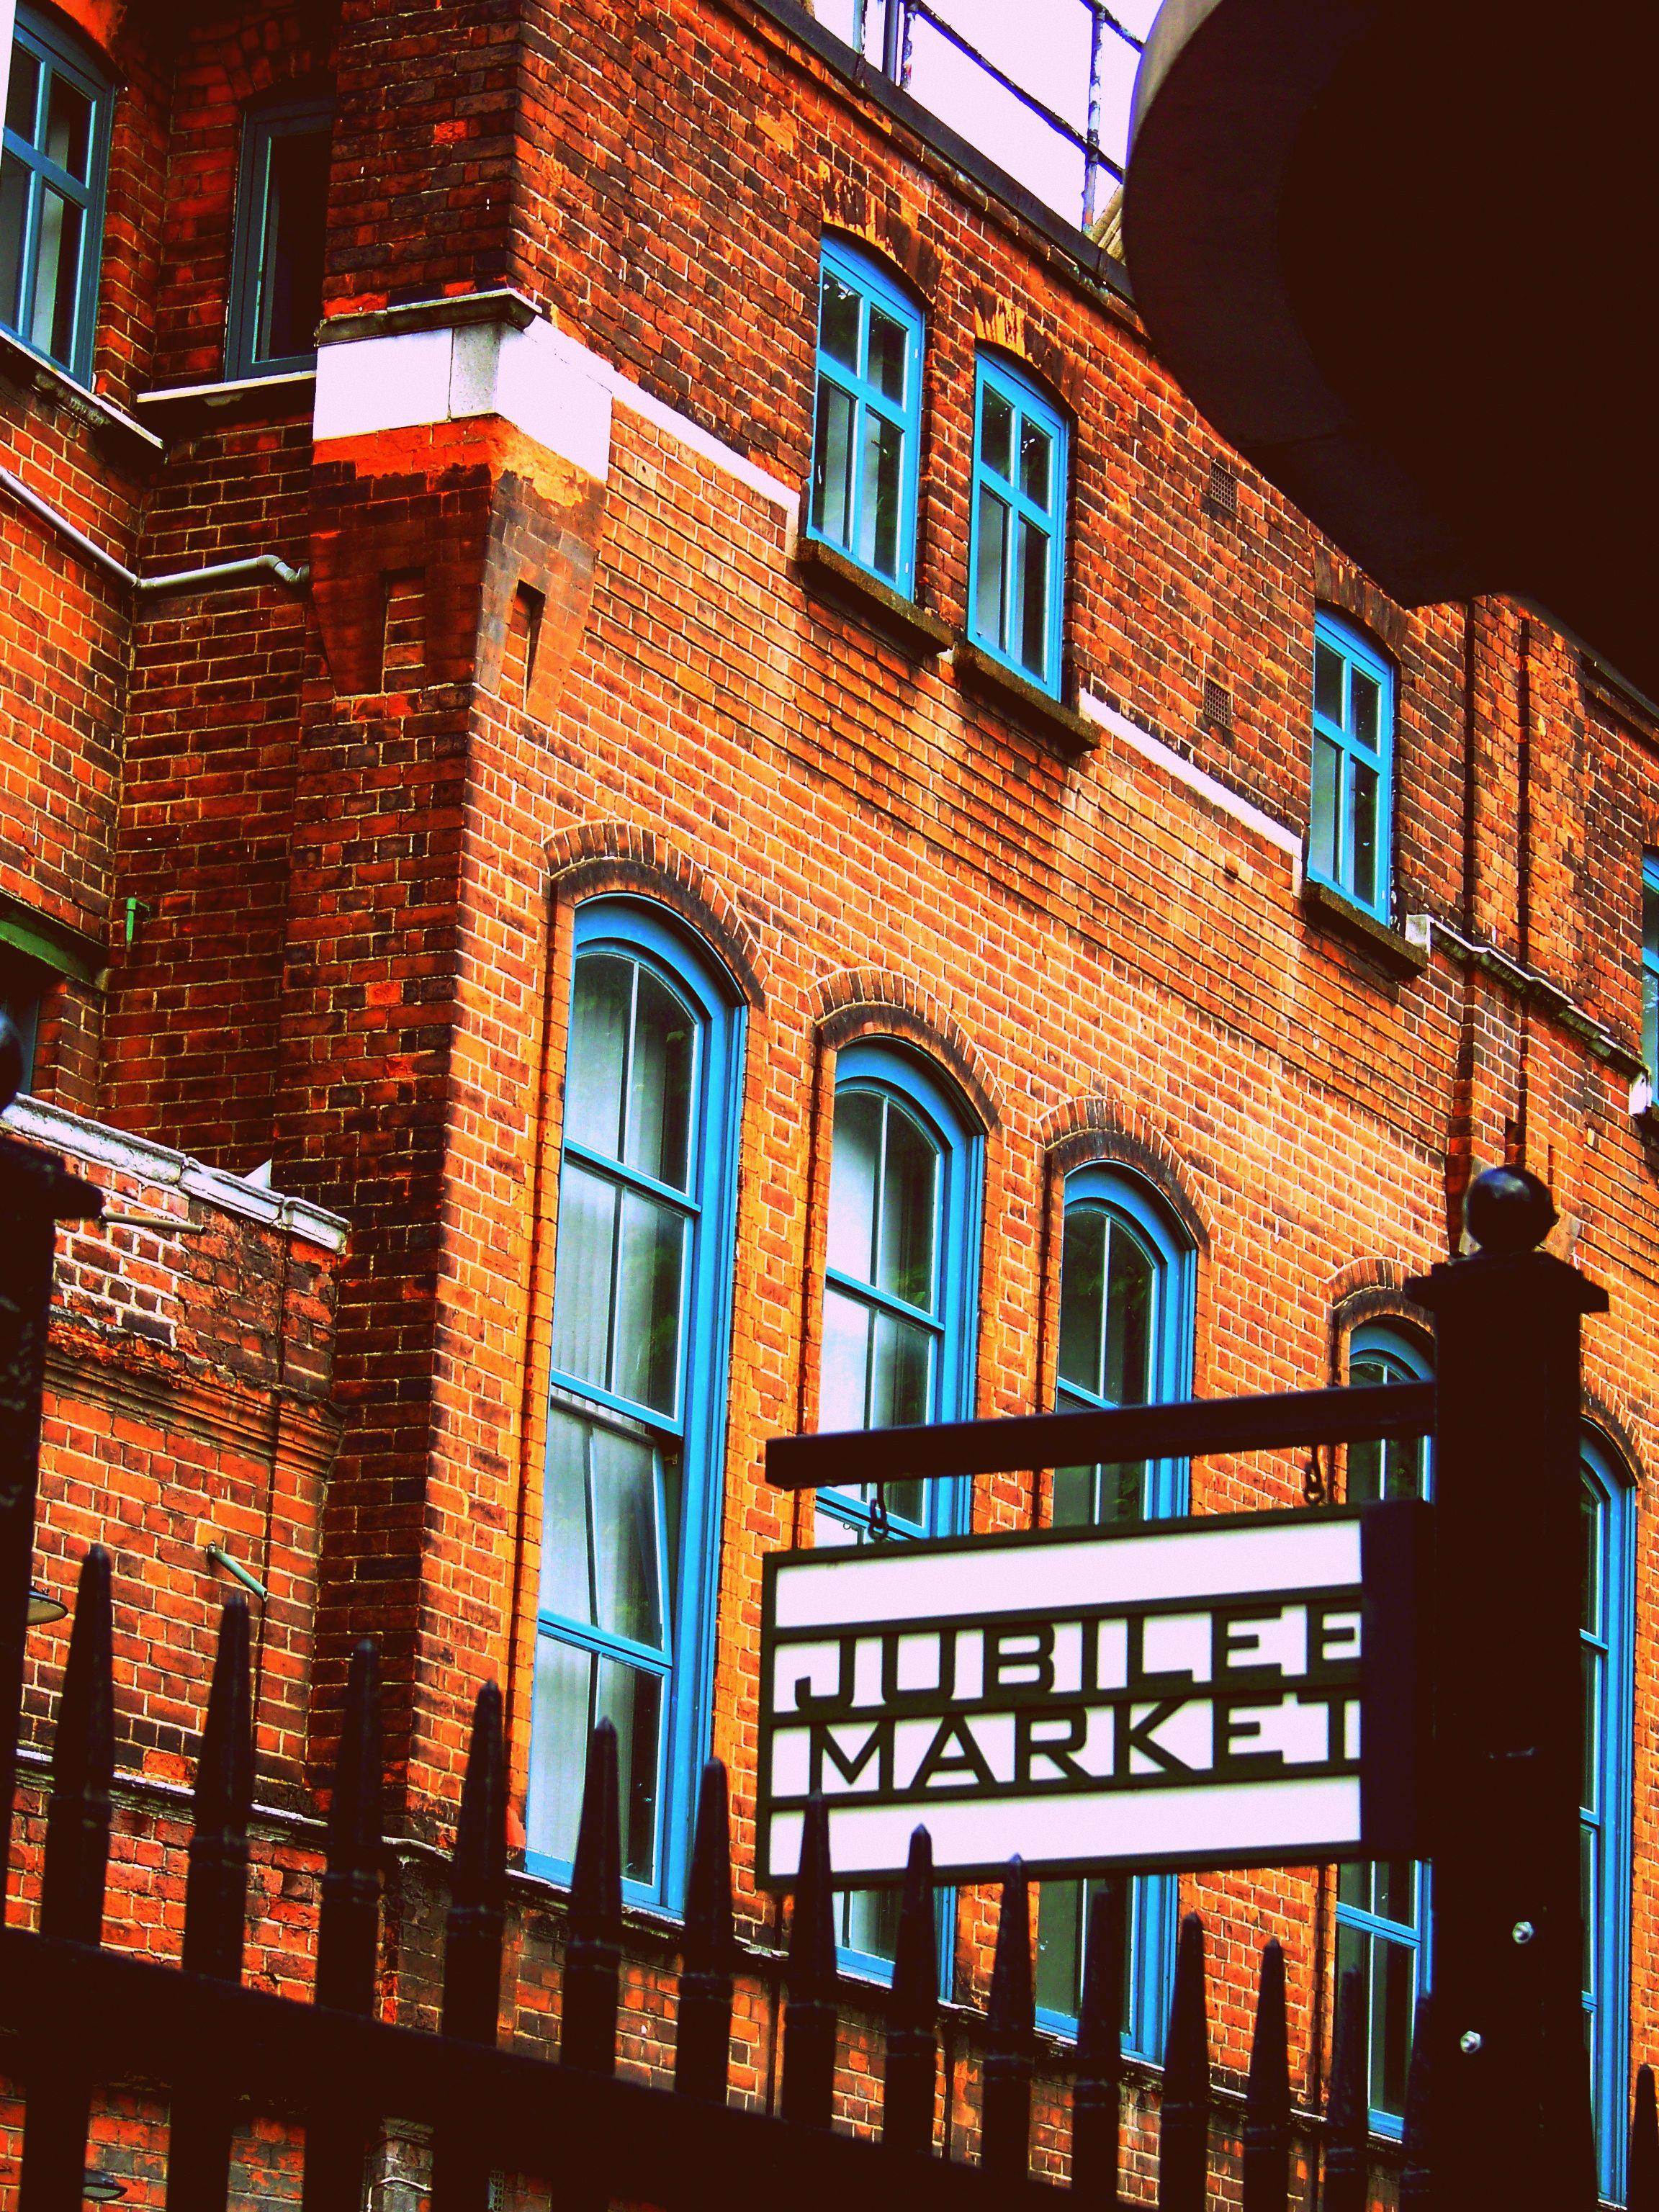 Jubilee Market, London Covent garden, London, The places